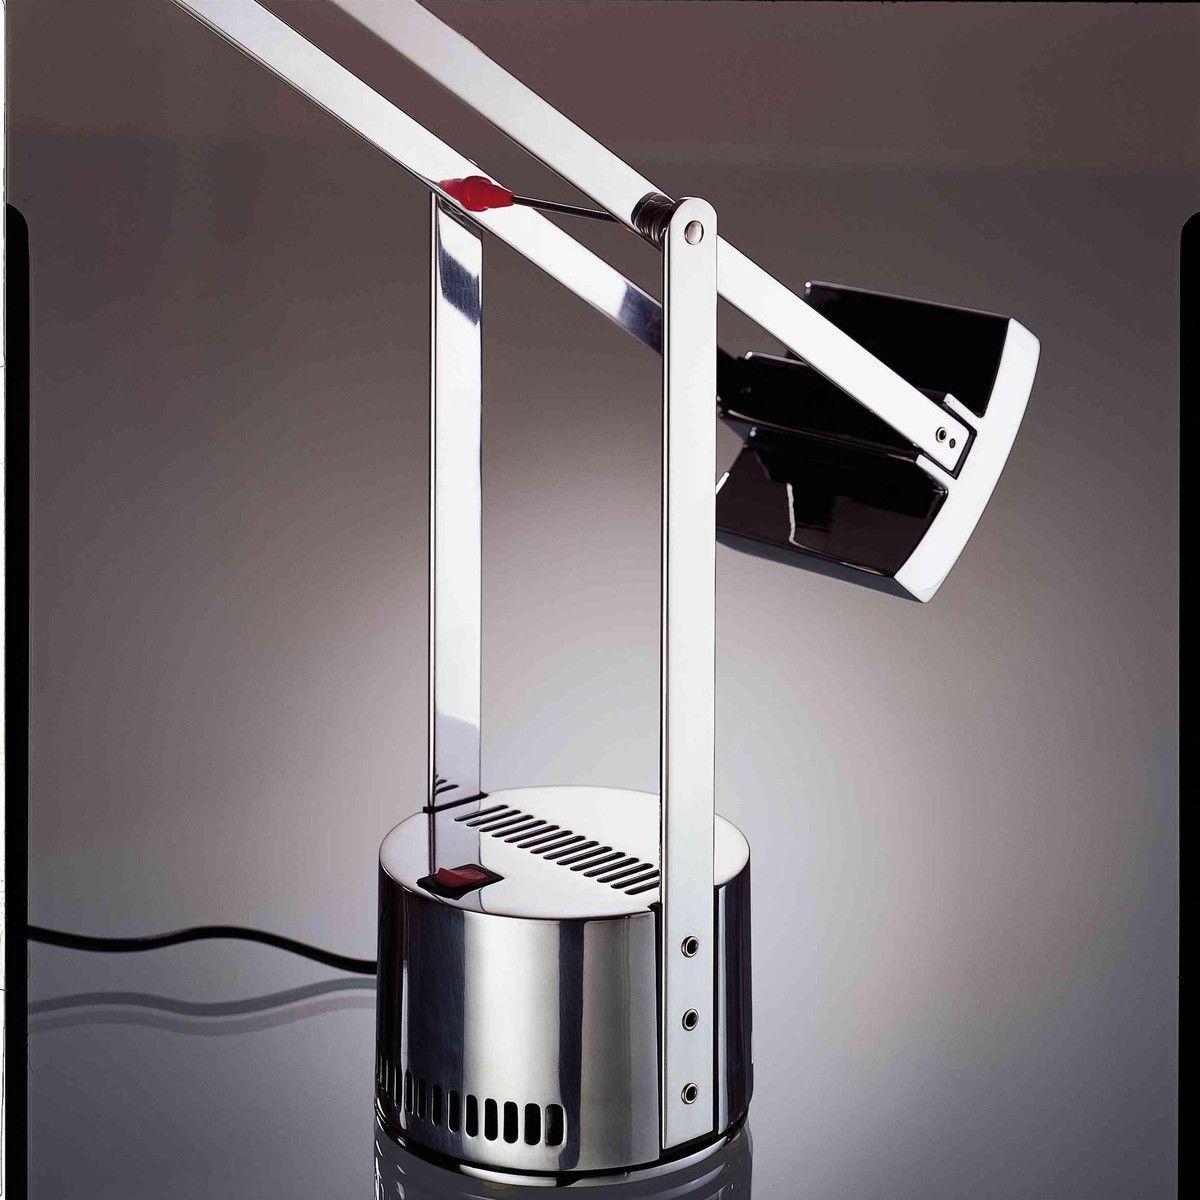 tizio x30 desk lamp artemide. Black Bedroom Furniture Sets. Home Design Ideas